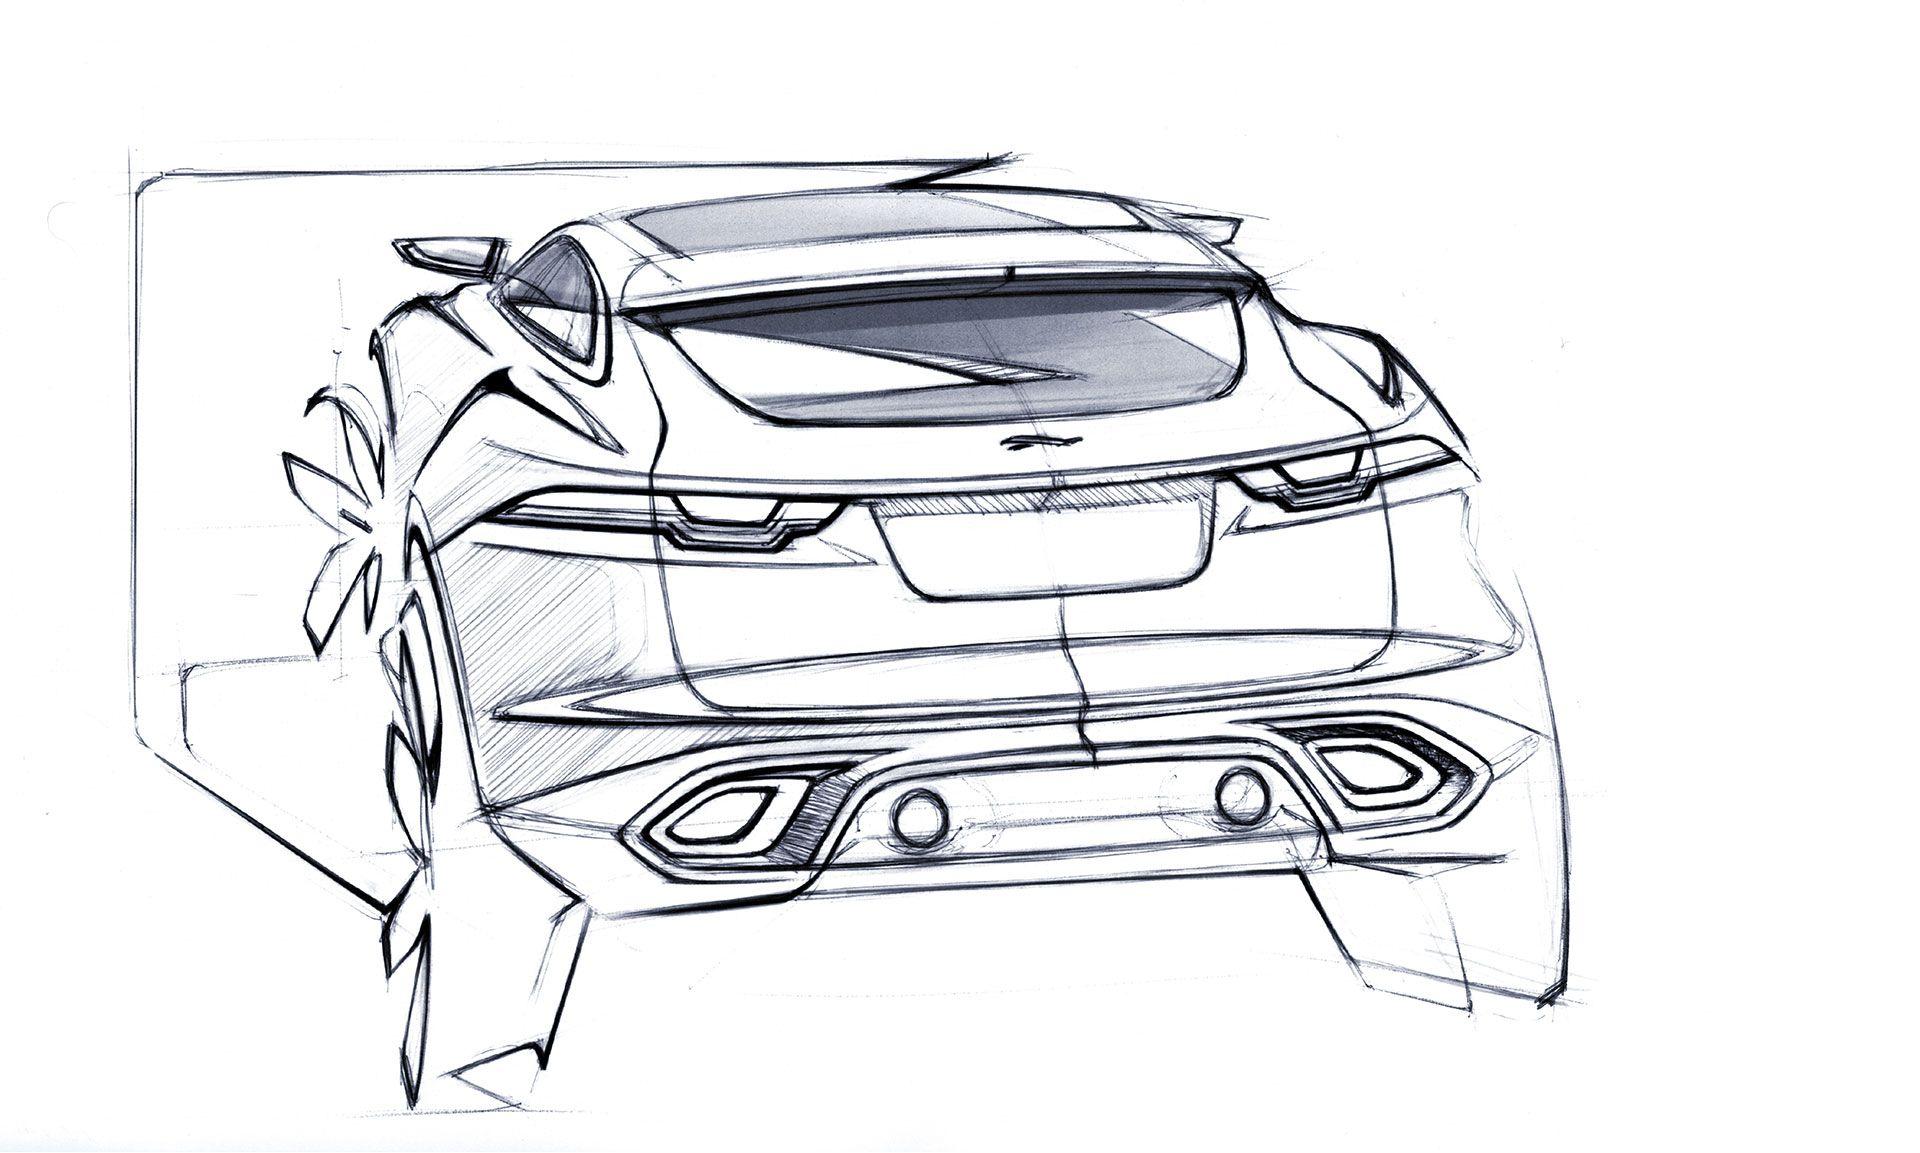 Jaguar C X17 Concept Design Sketch